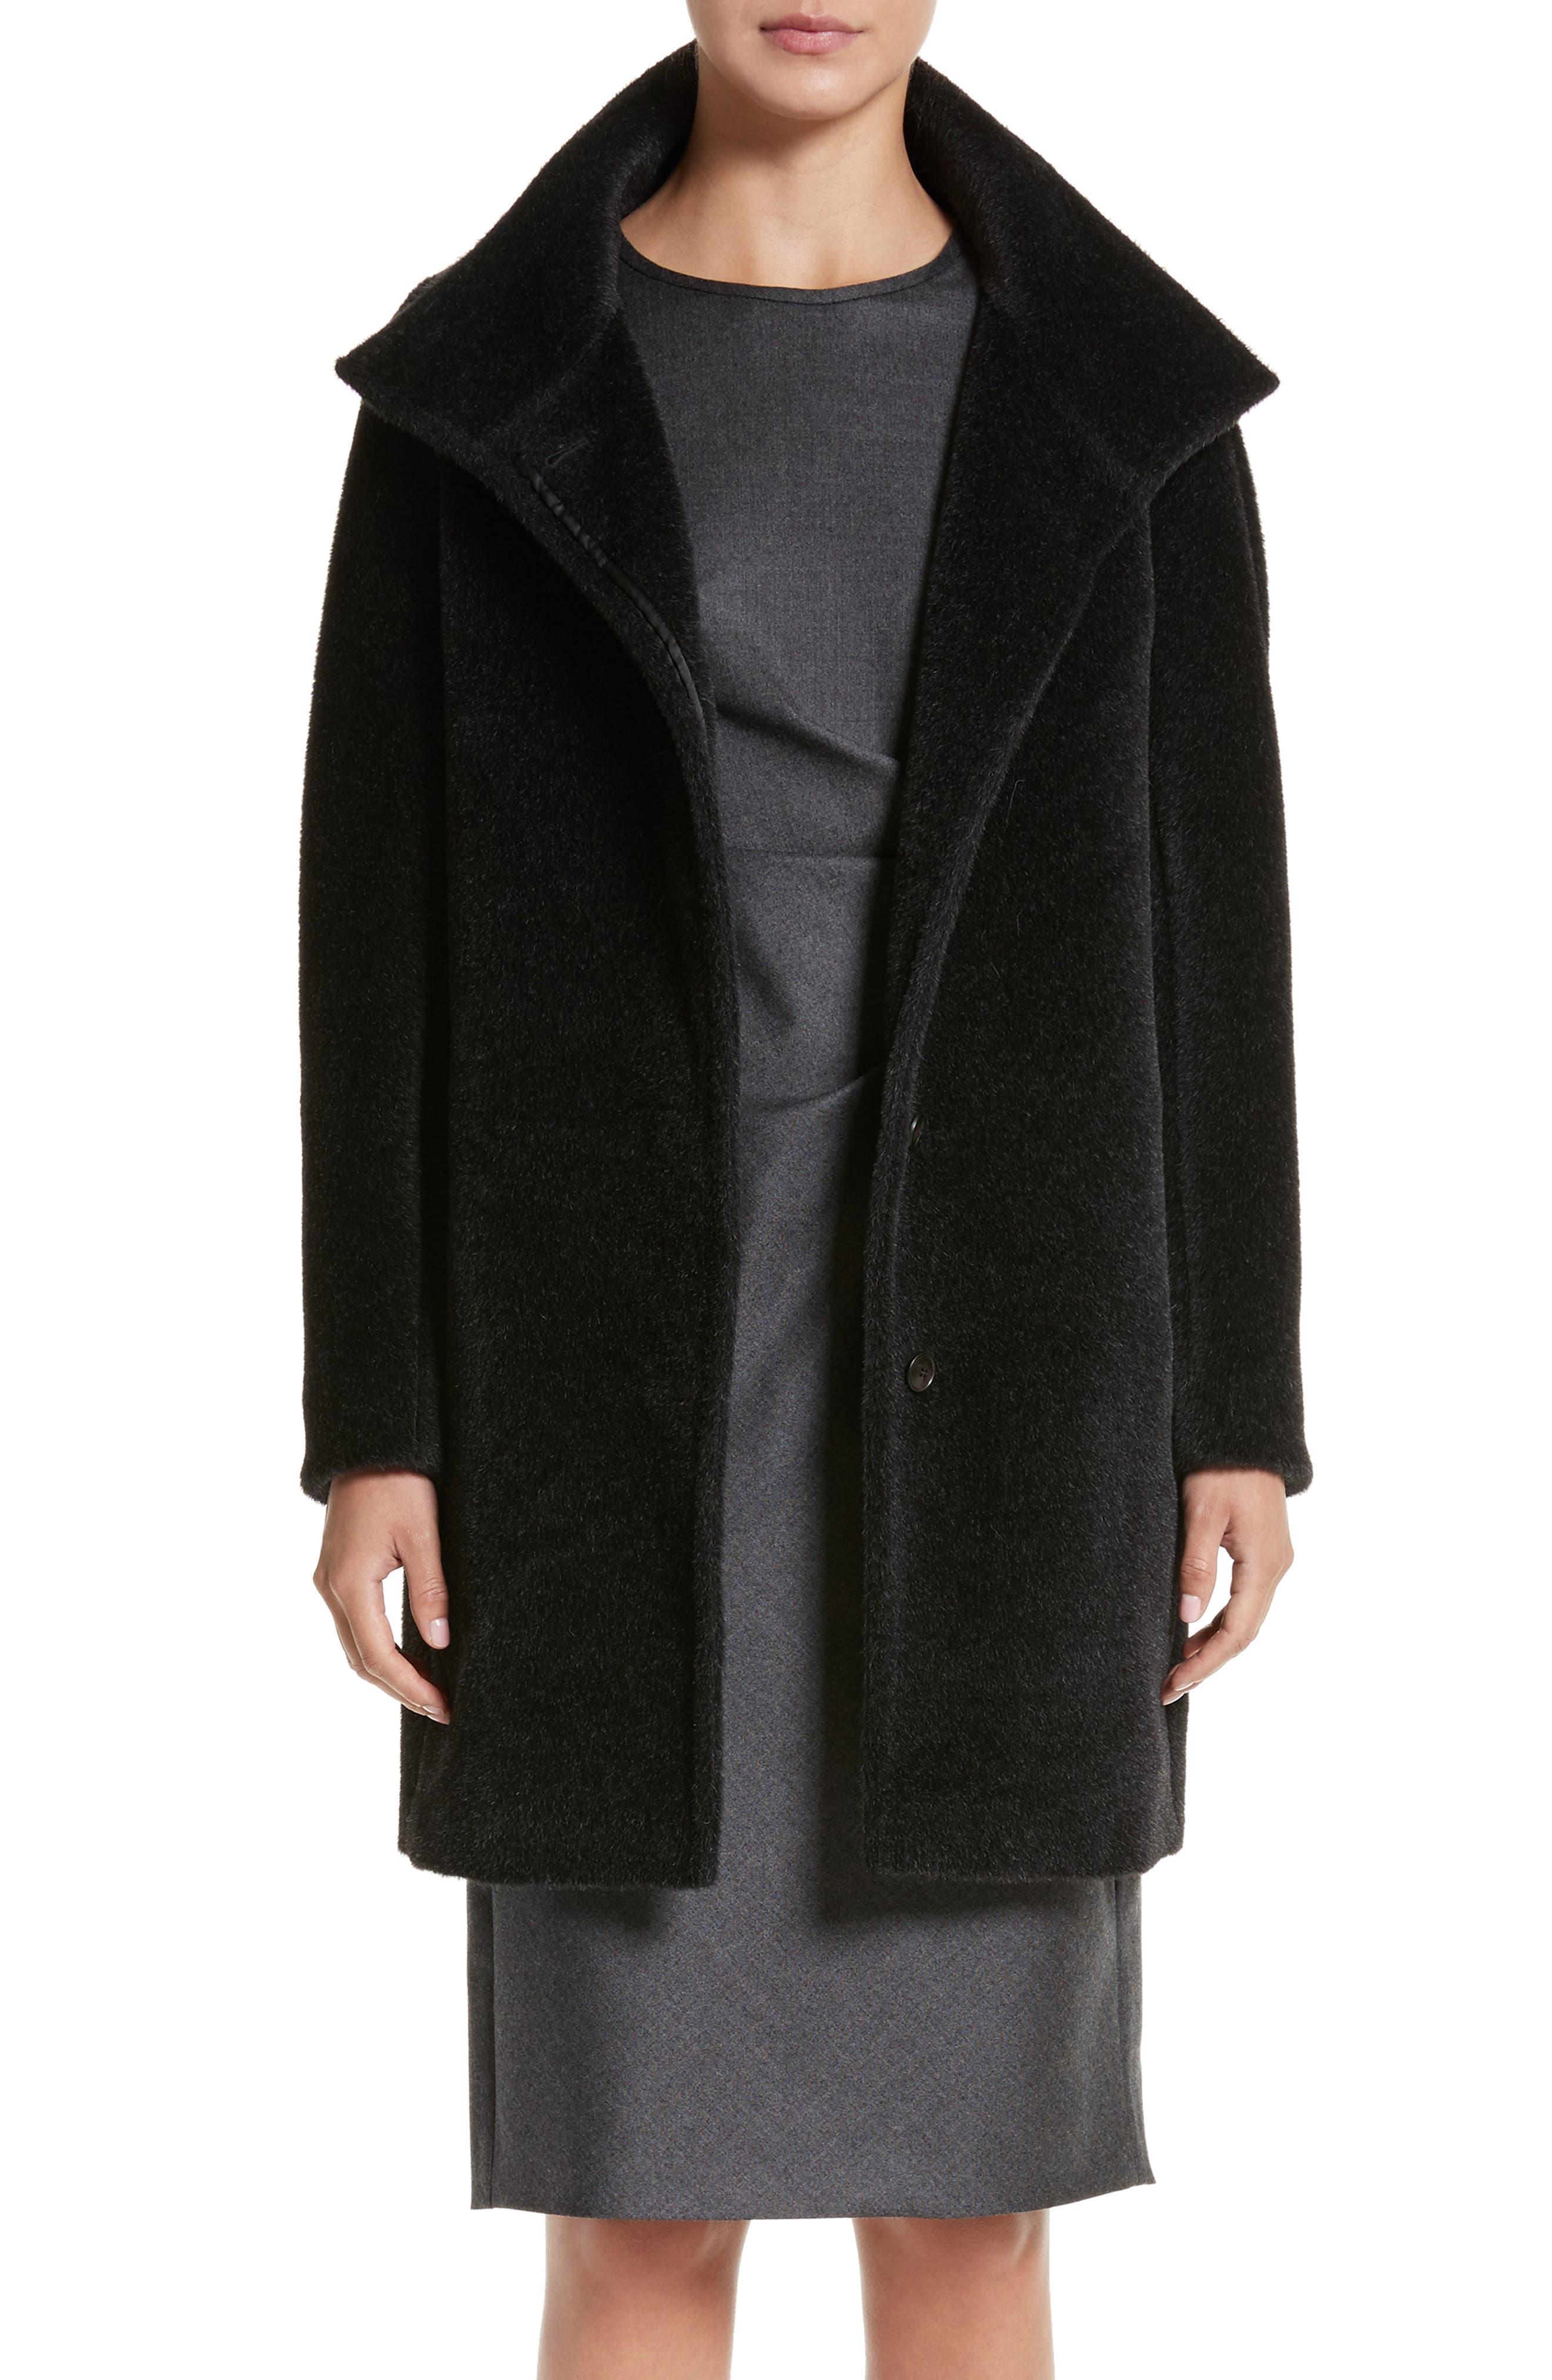 Alternate Image 1 Selected - Max Mara Alpaca & Wool Coat